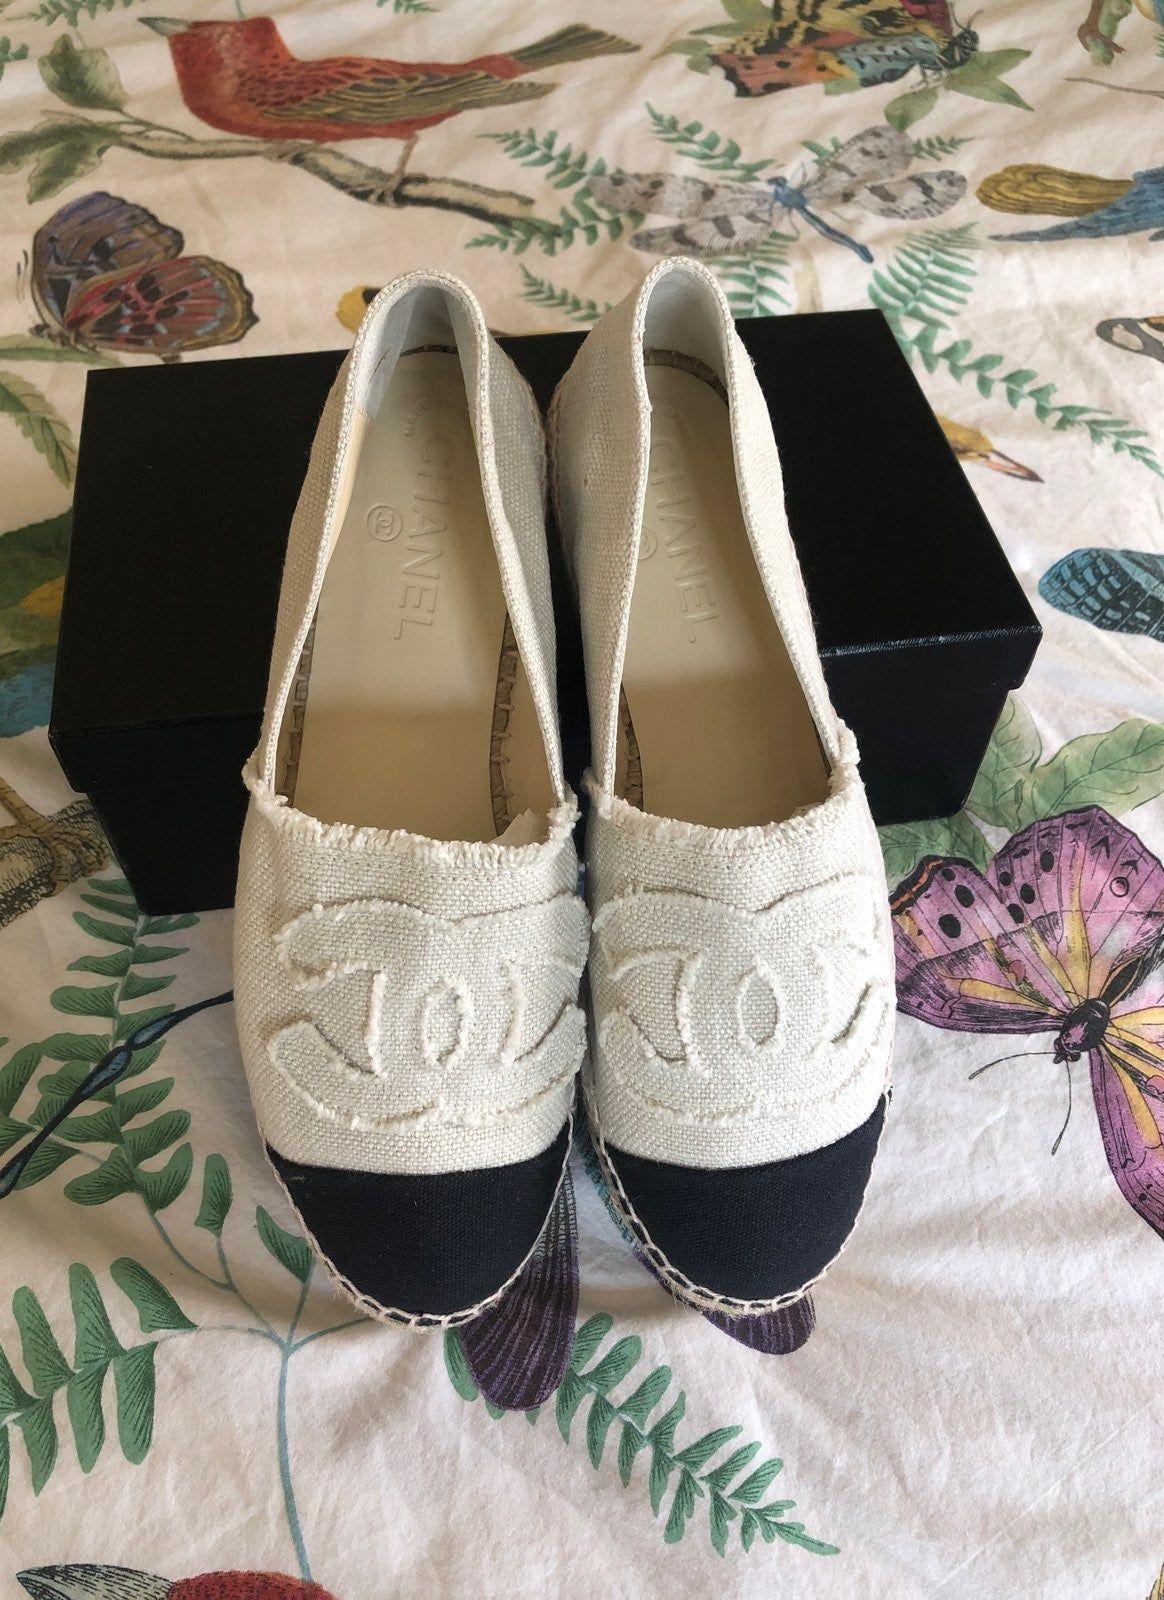 Authentic Chanel espadrilles Never worn